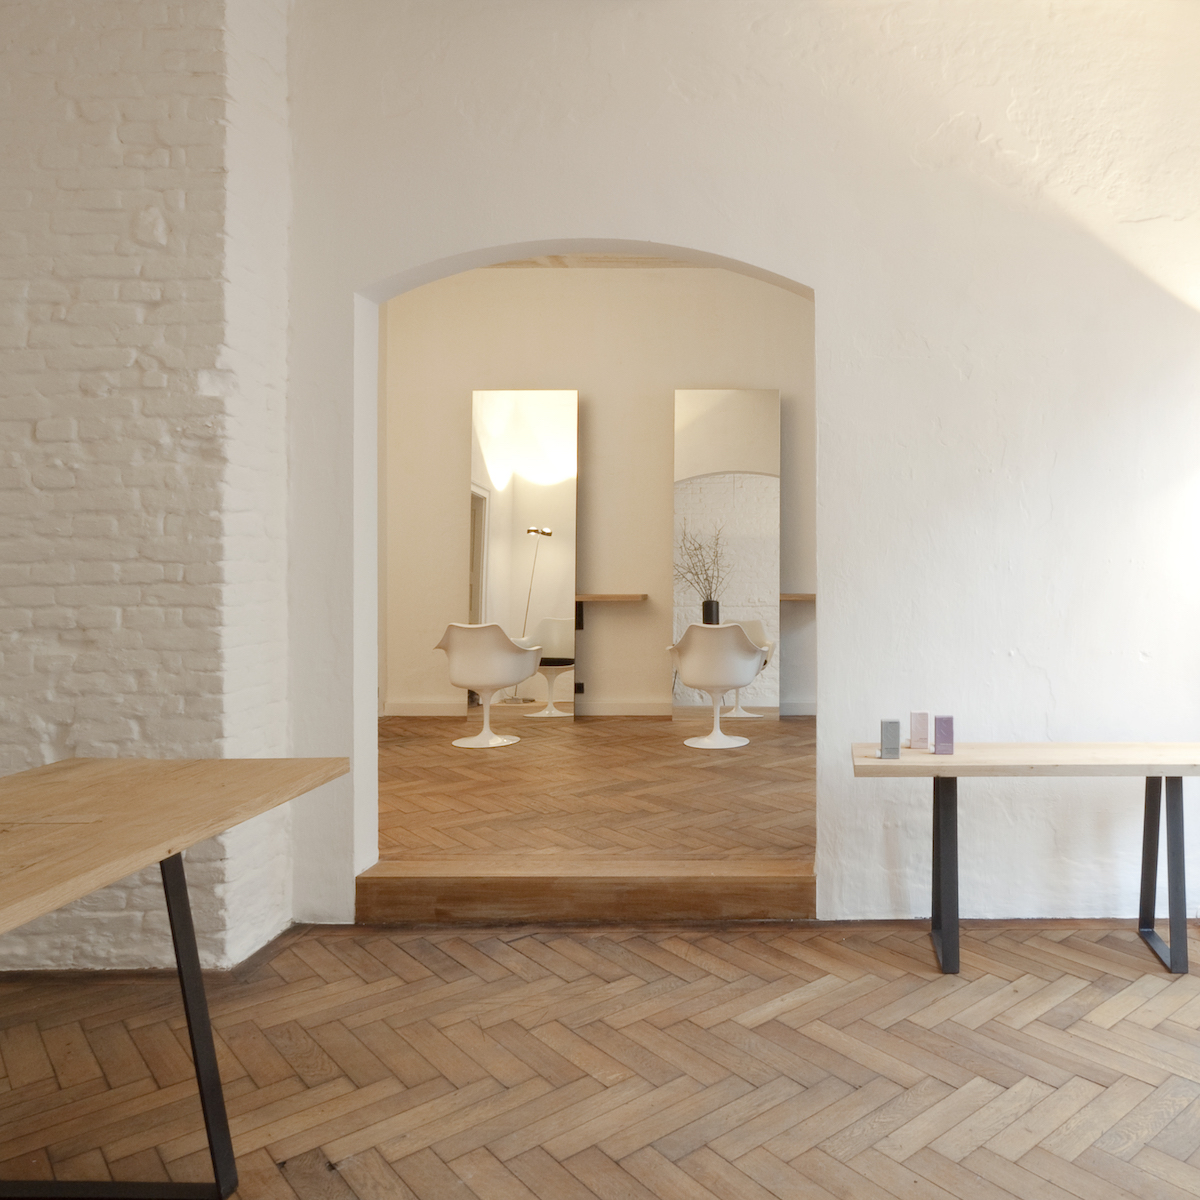 Dressler Friseur Salon Schwabing_Raumteilung